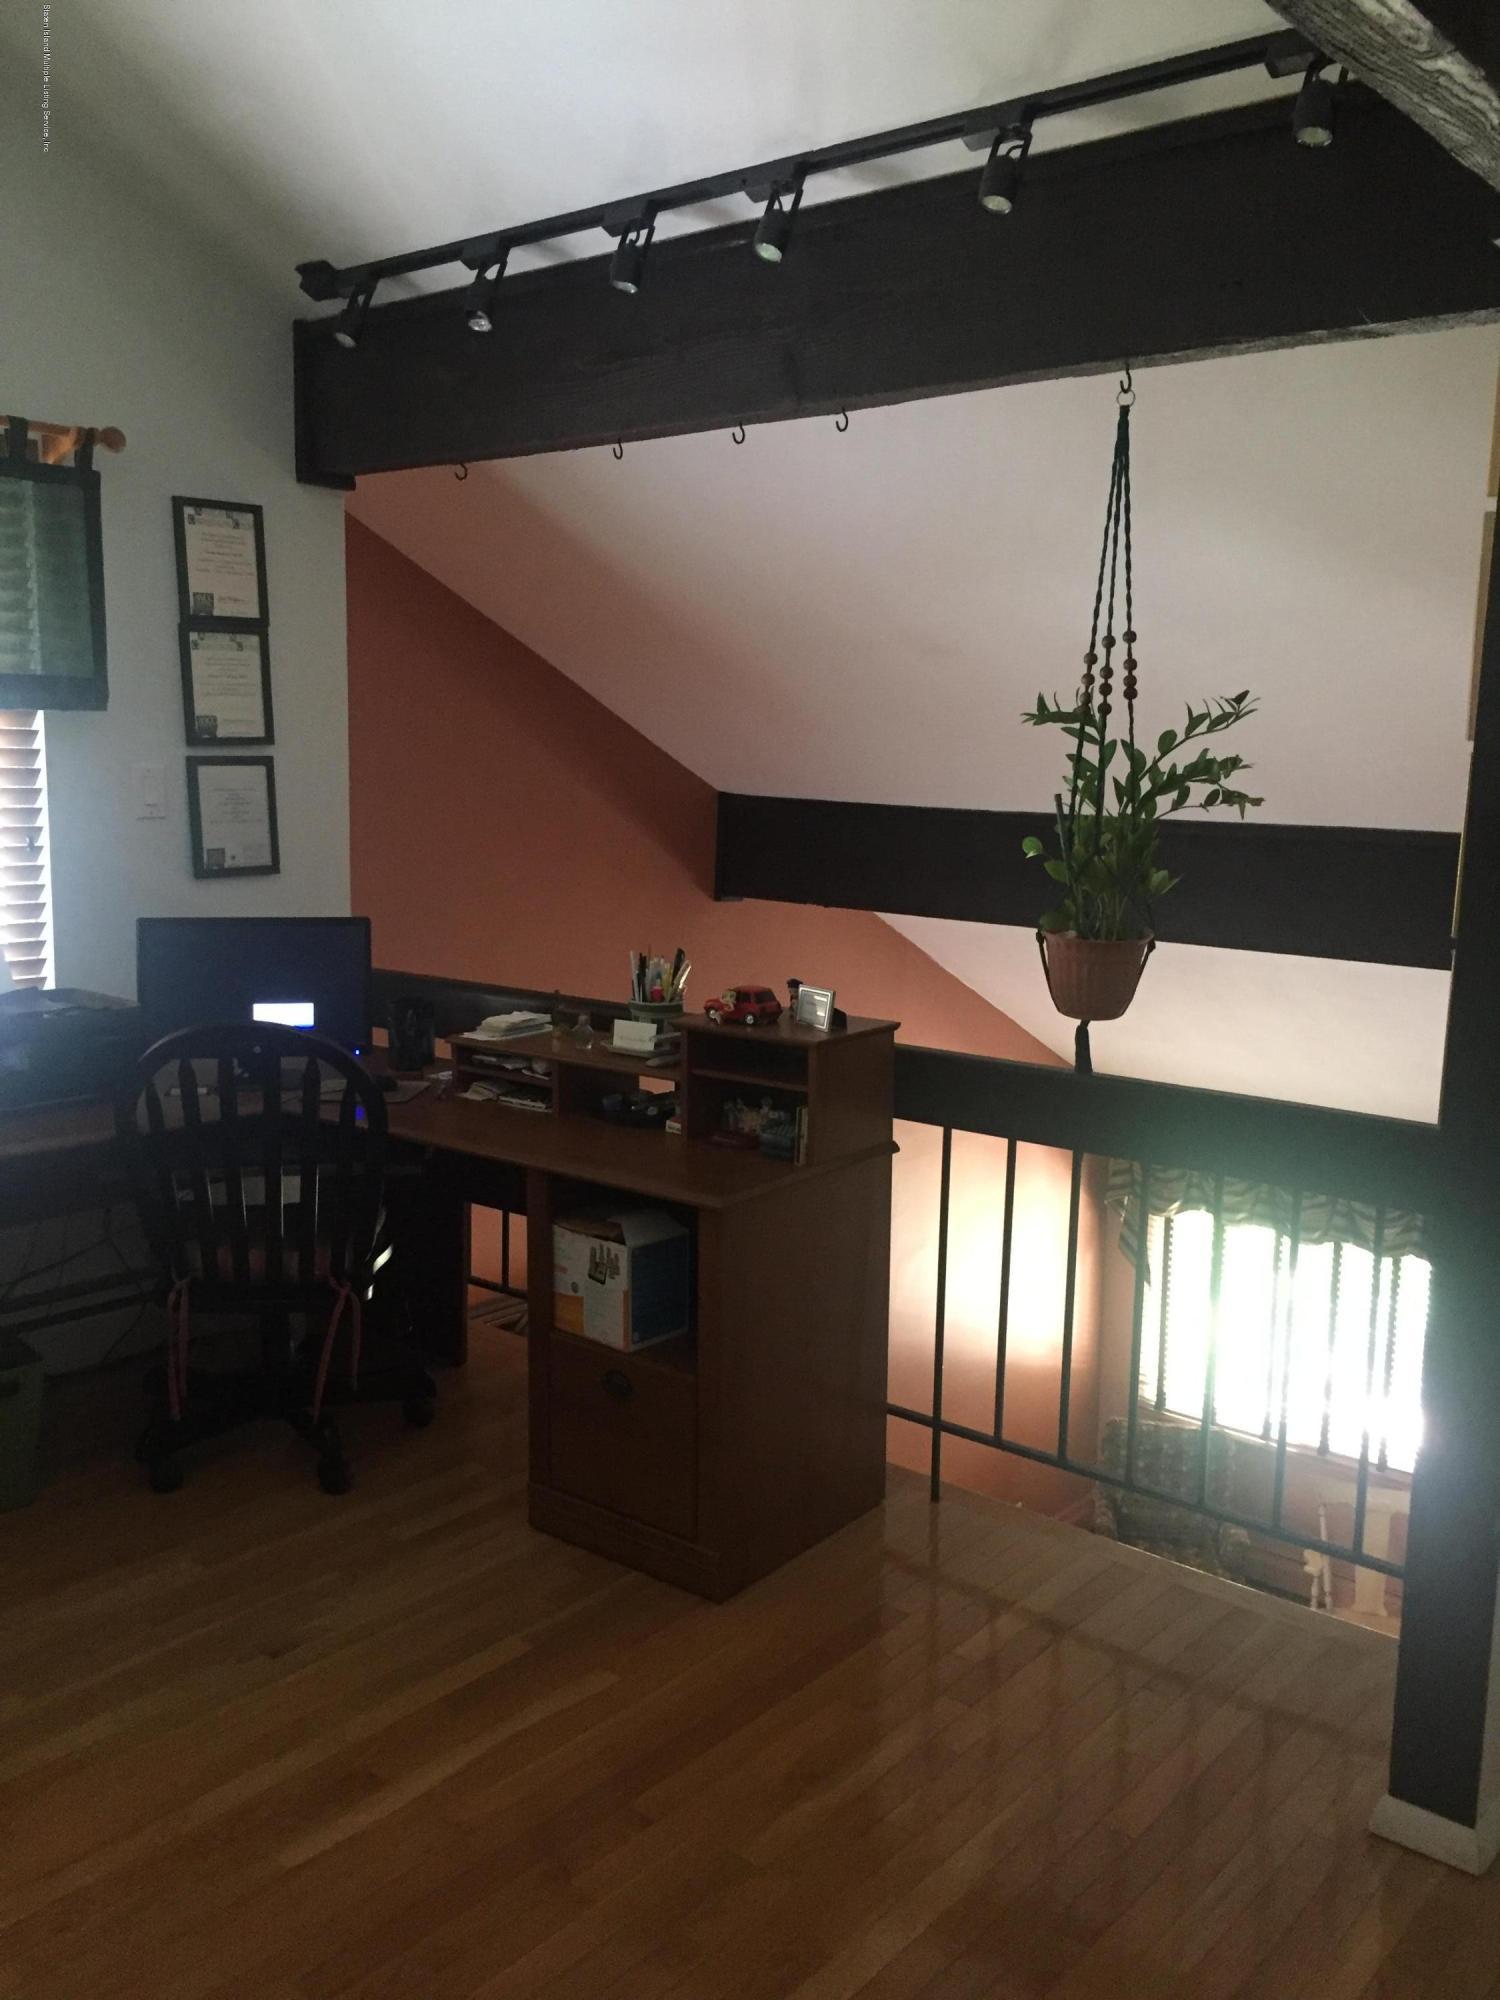 Single Family - Detached 46 Forrestal Avenue  Staten Island, NY 10312, MLS-1131922-29